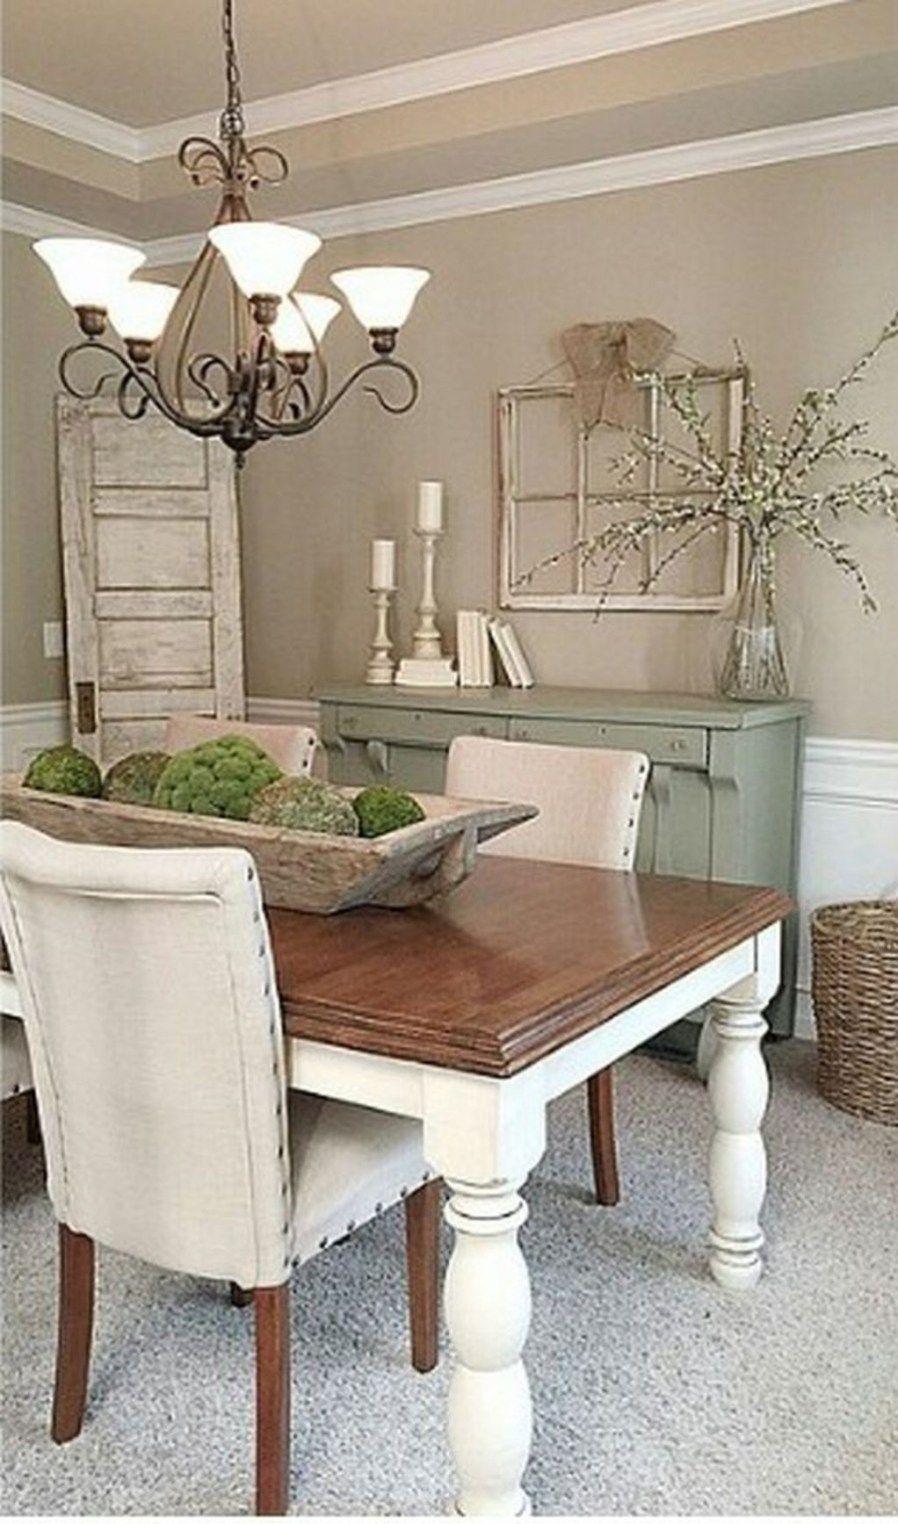 Rustic Farmhouse Living Room Decor Ideas 16 For The Home